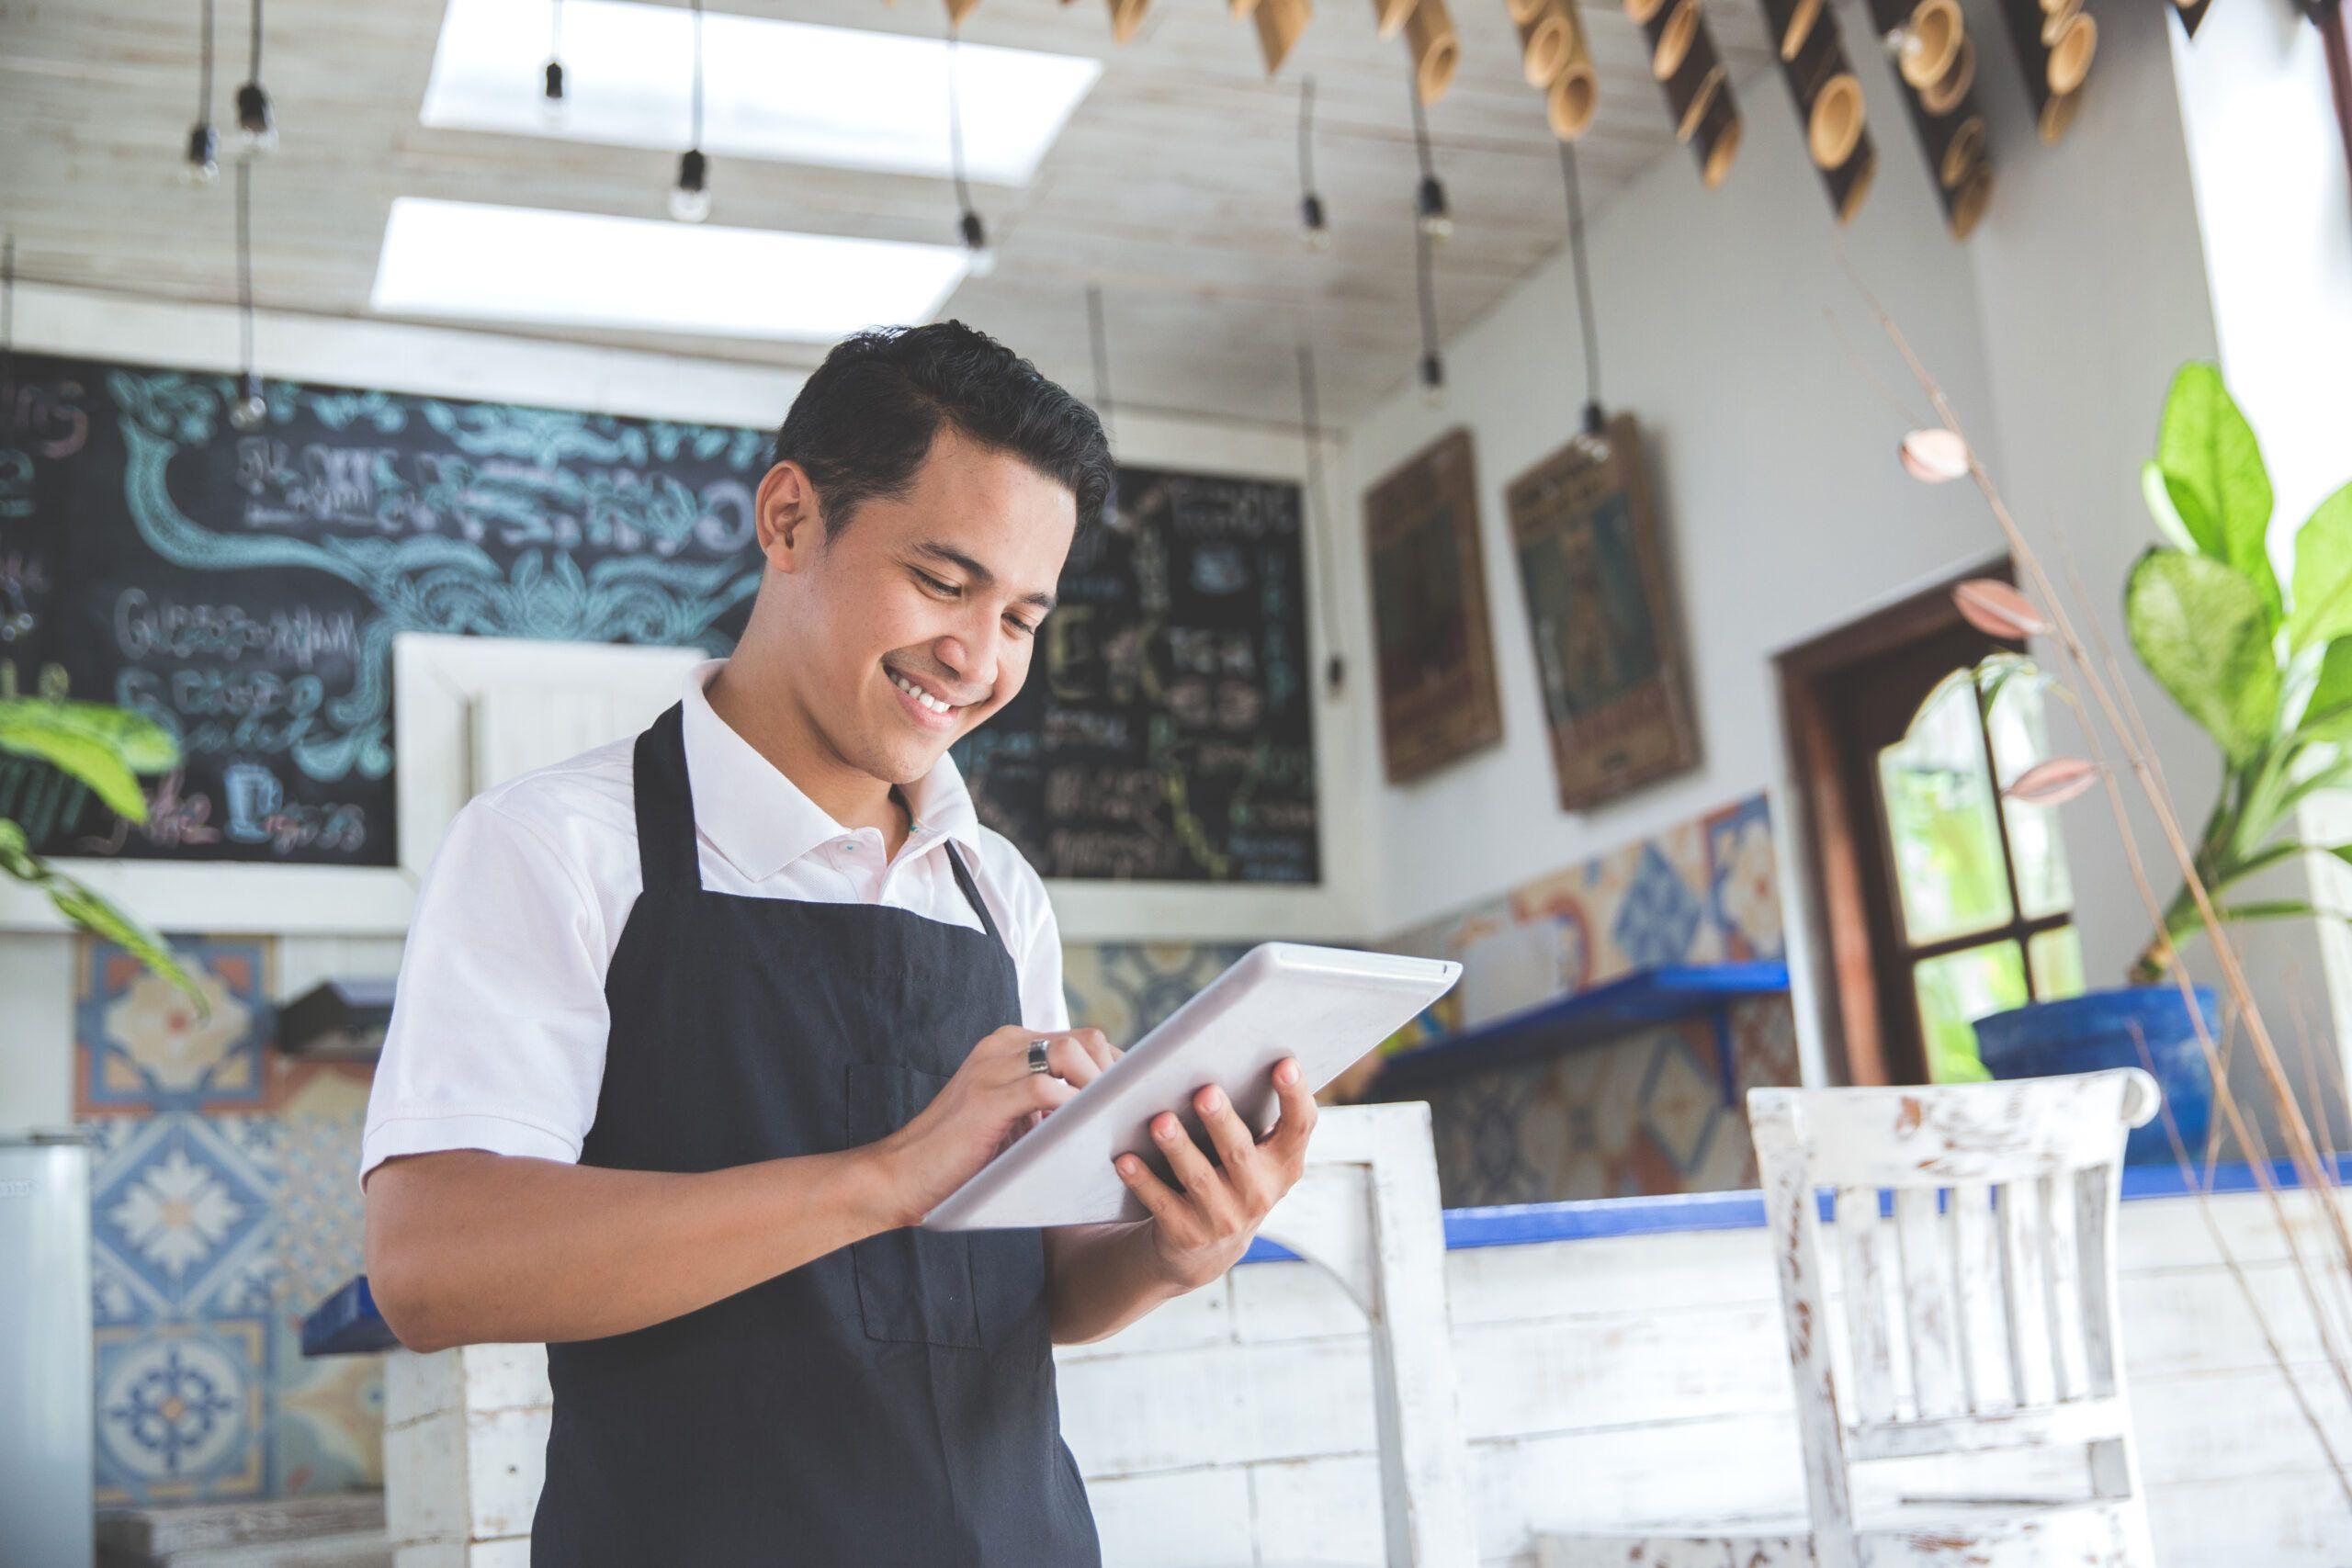 10 Common Small Business Tax Deductions | WalletGenius